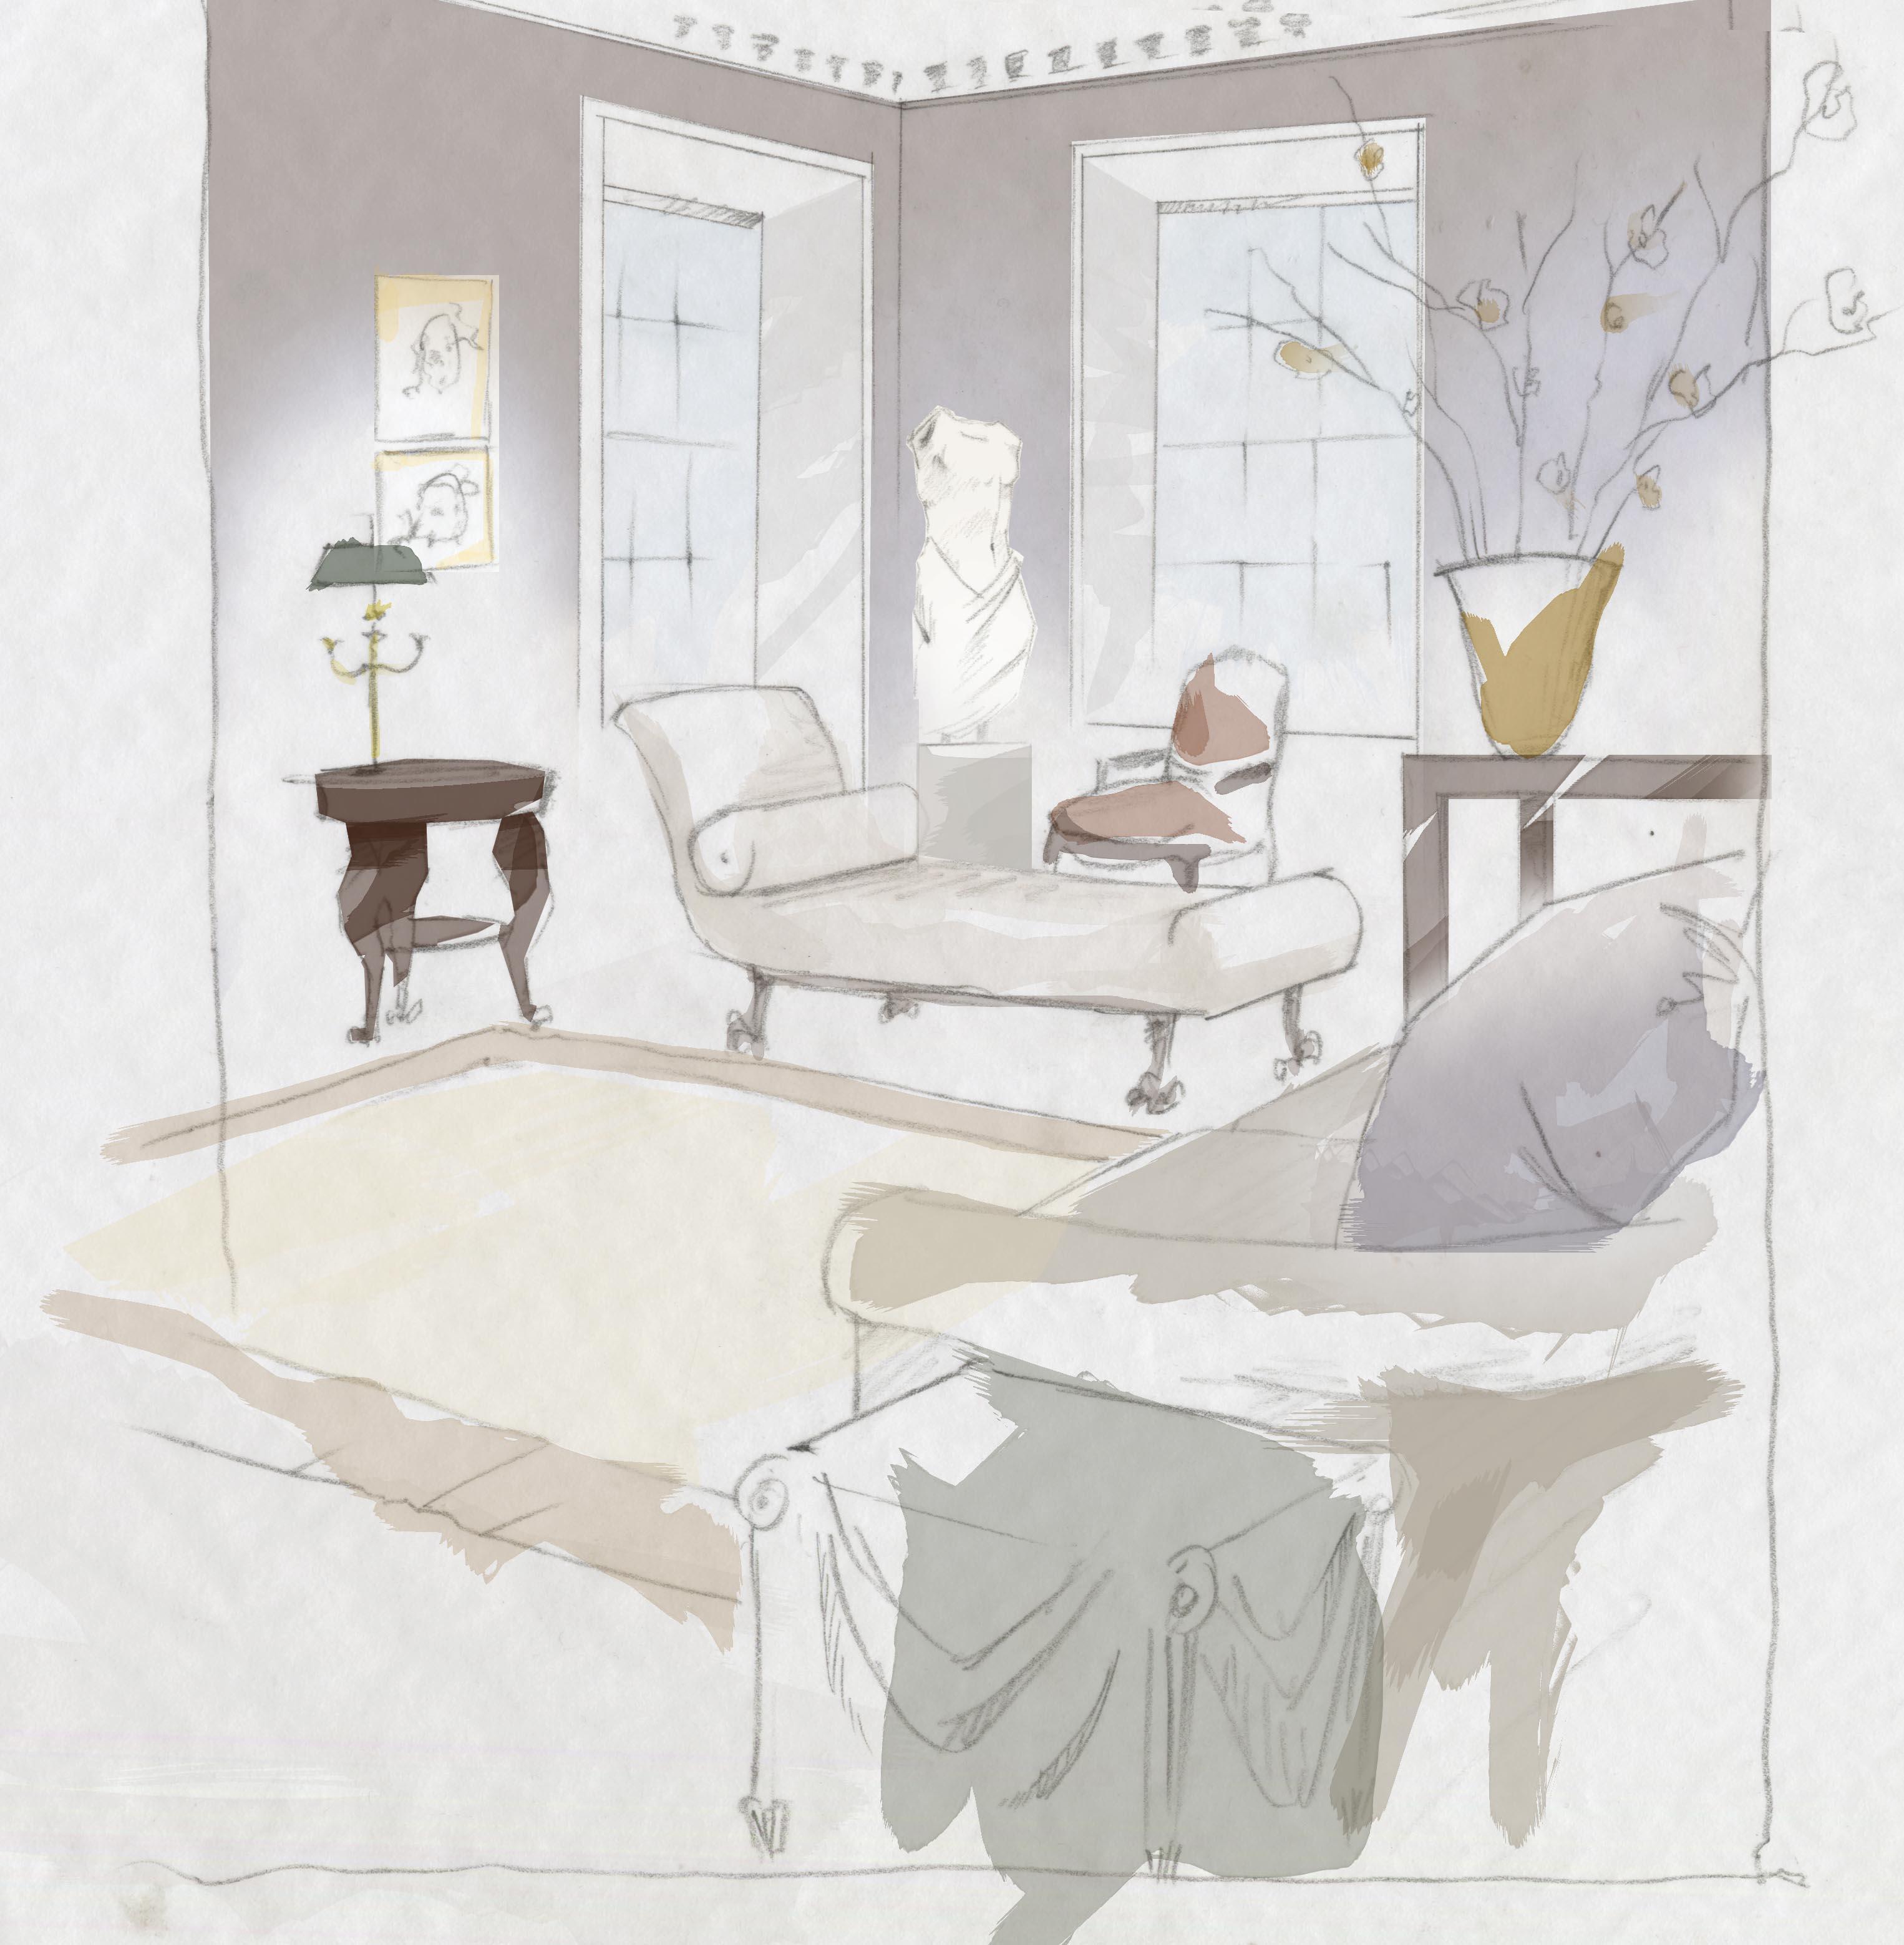 McMillen Plus Category interior design